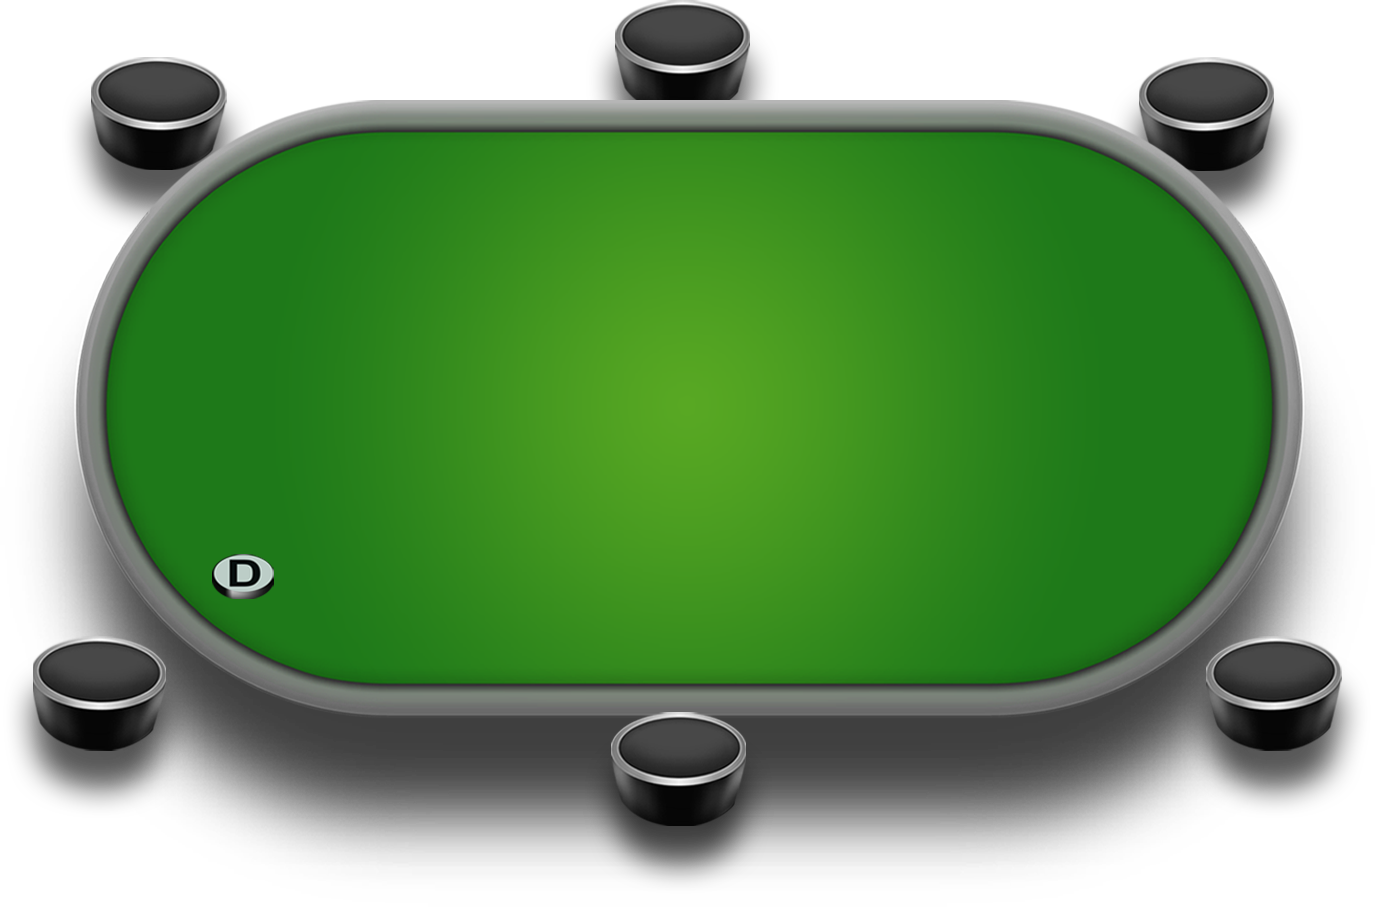 Poker Table Clipart Png In 2020 Poker Table Poker Table Diy Poker